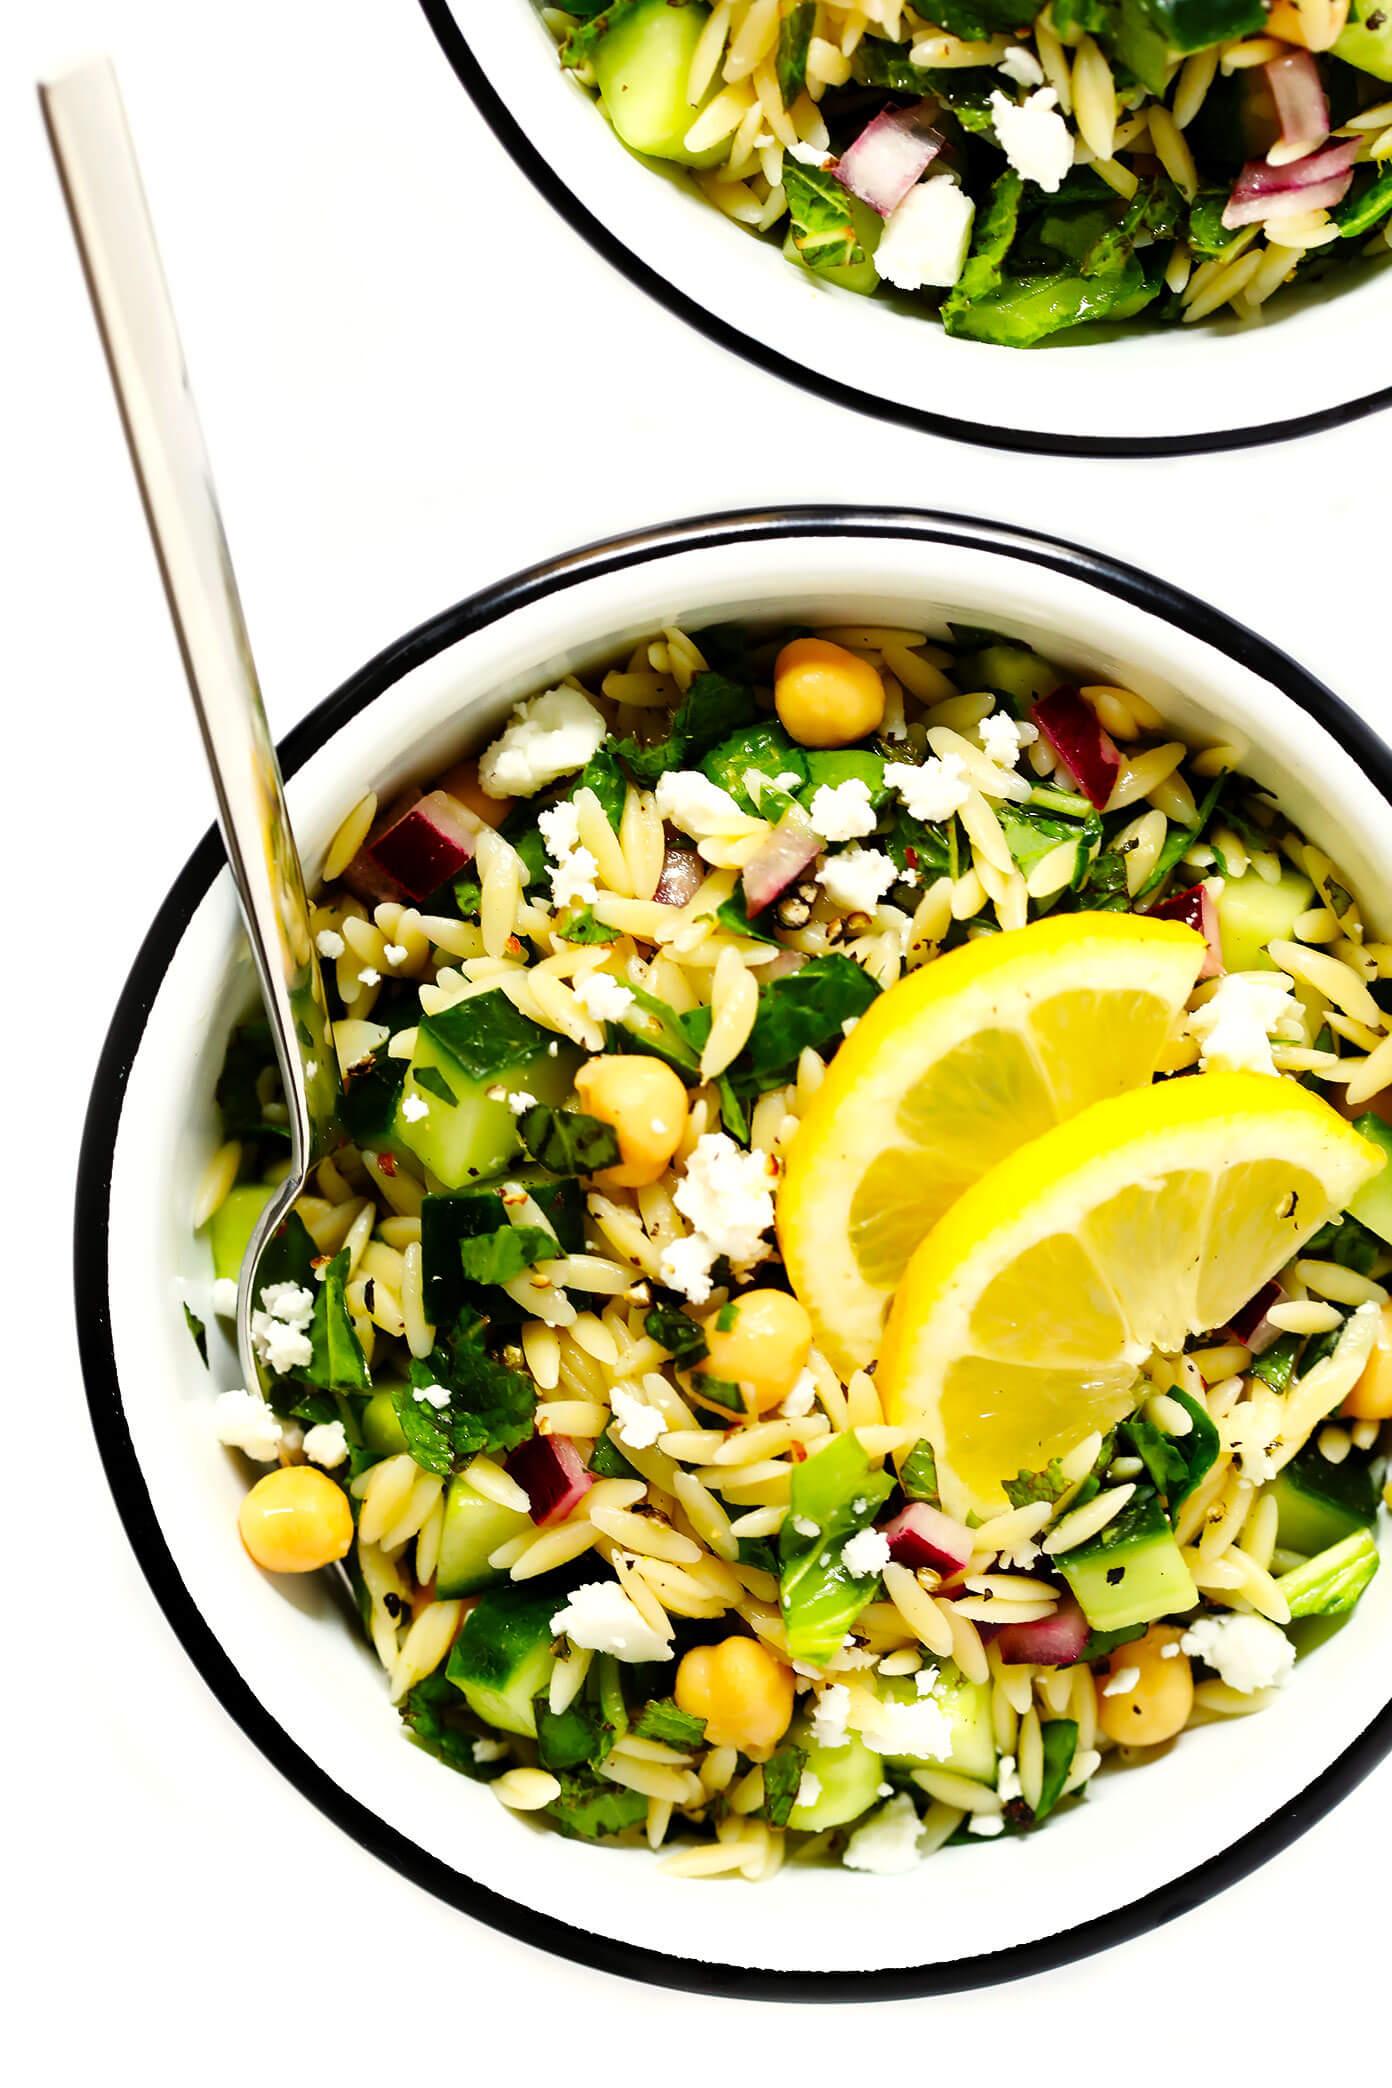 Lemony-Spinach-Cucumber-Orzo-Salad-Recipe-5-1.jpg